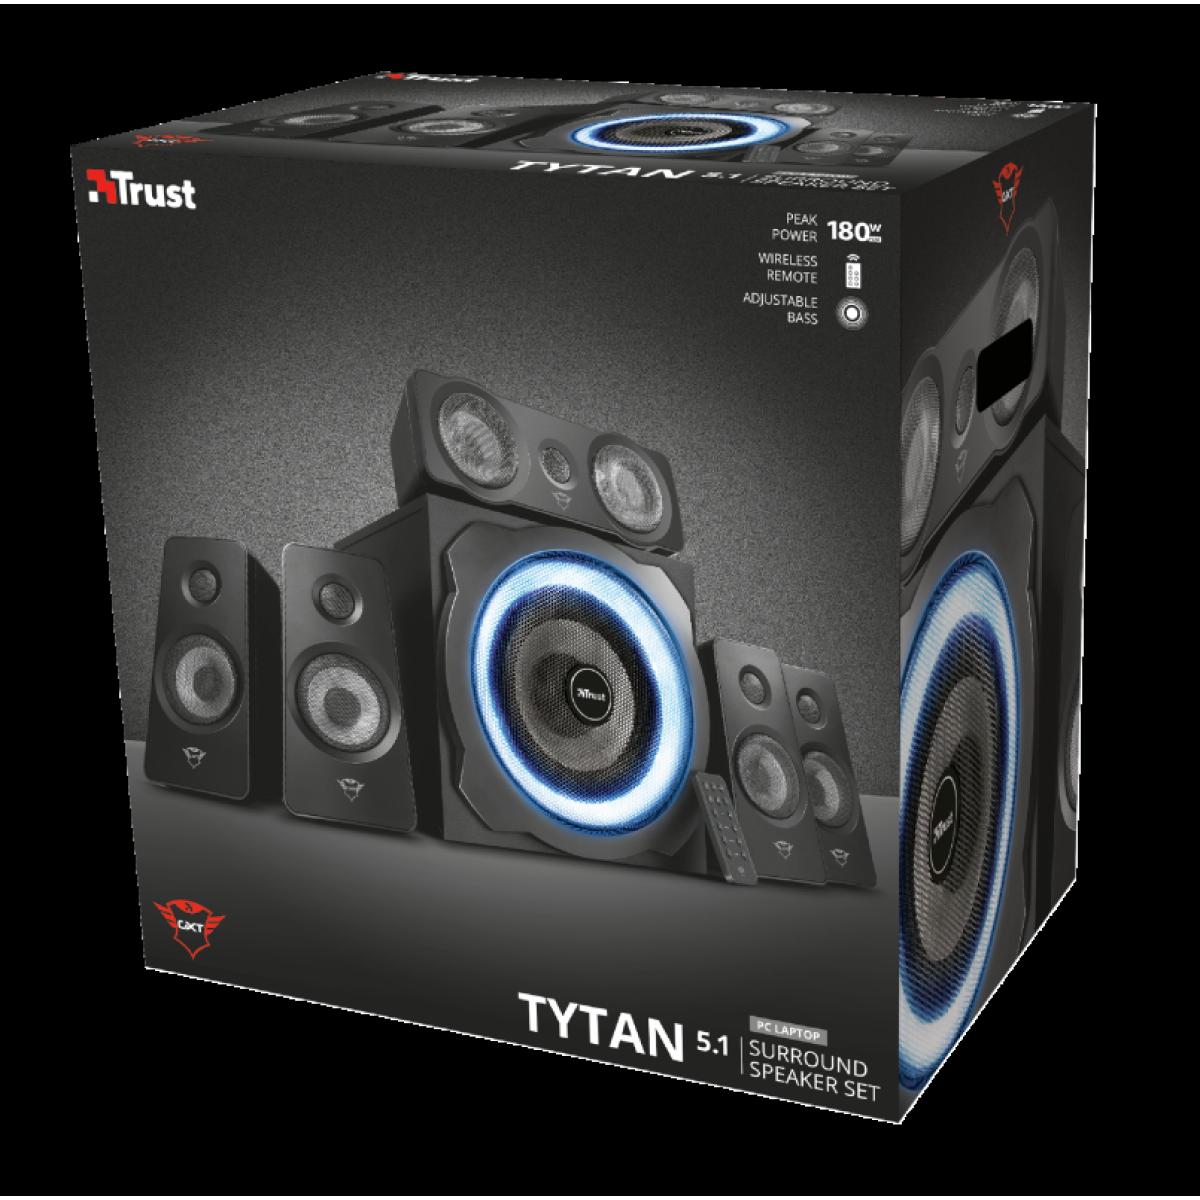 Caixa de Som Trust, GXT 658 Tytan, 3.5mm, Led Blue, 5.1, 90RMS, 180W, T21738